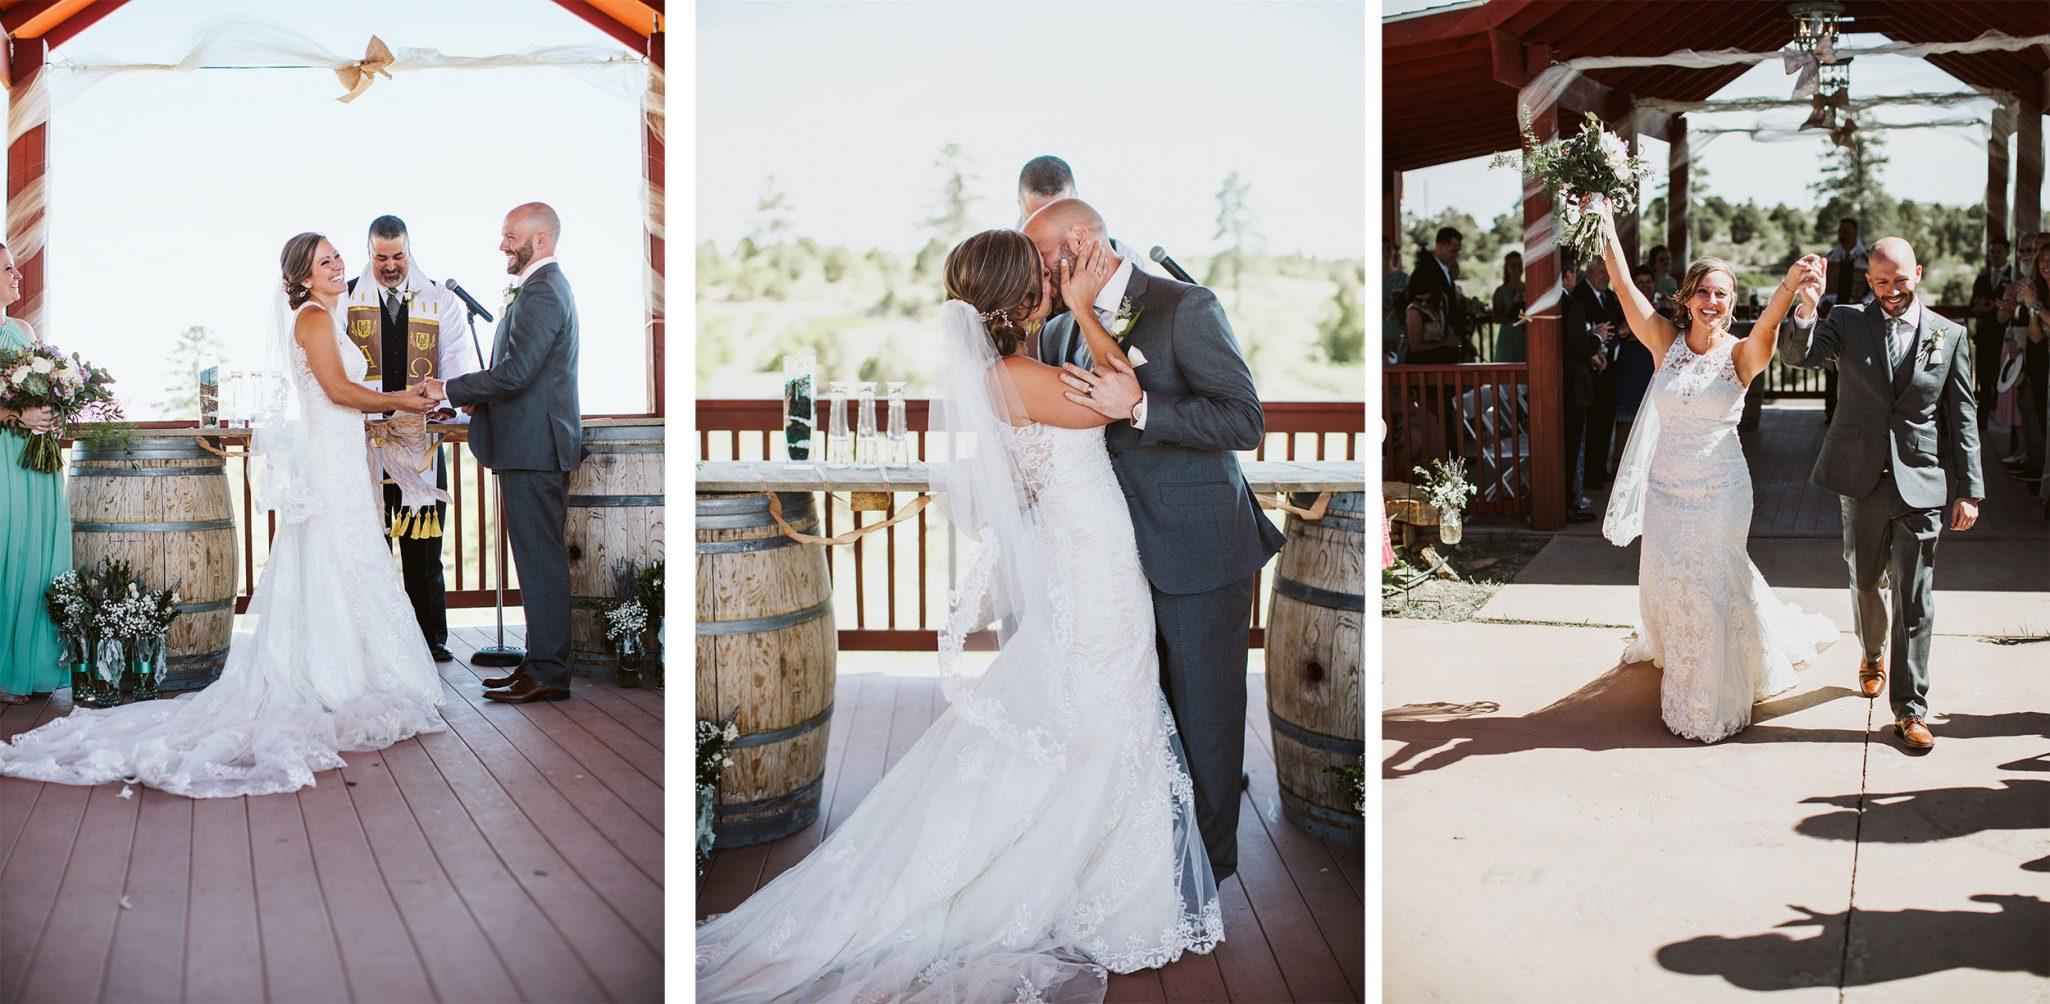 Ceremomy at Sophia Retreat Center | Durango Weddings Magazine